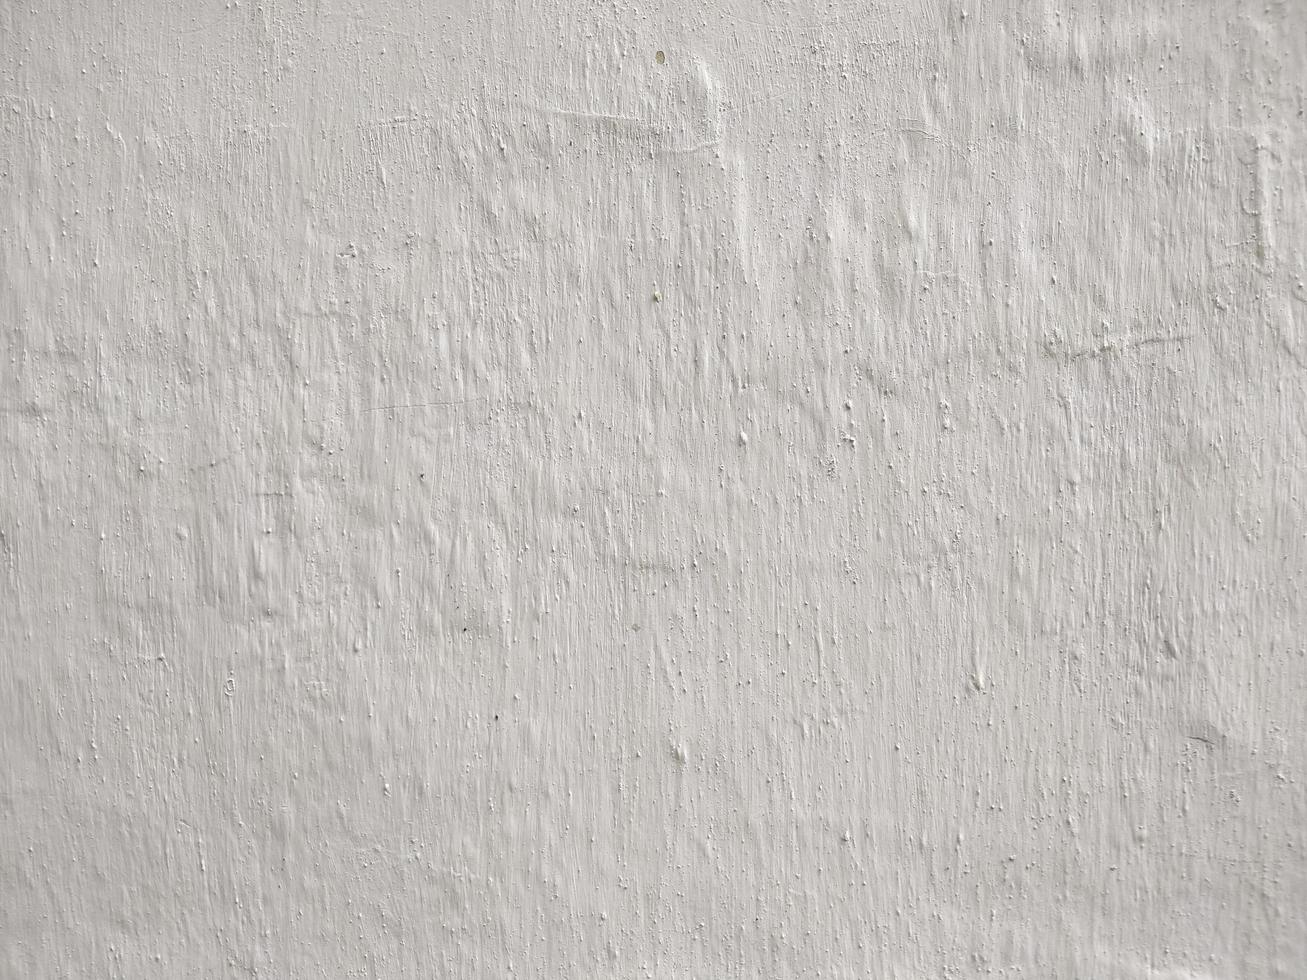 muro dipinto di bianco foto